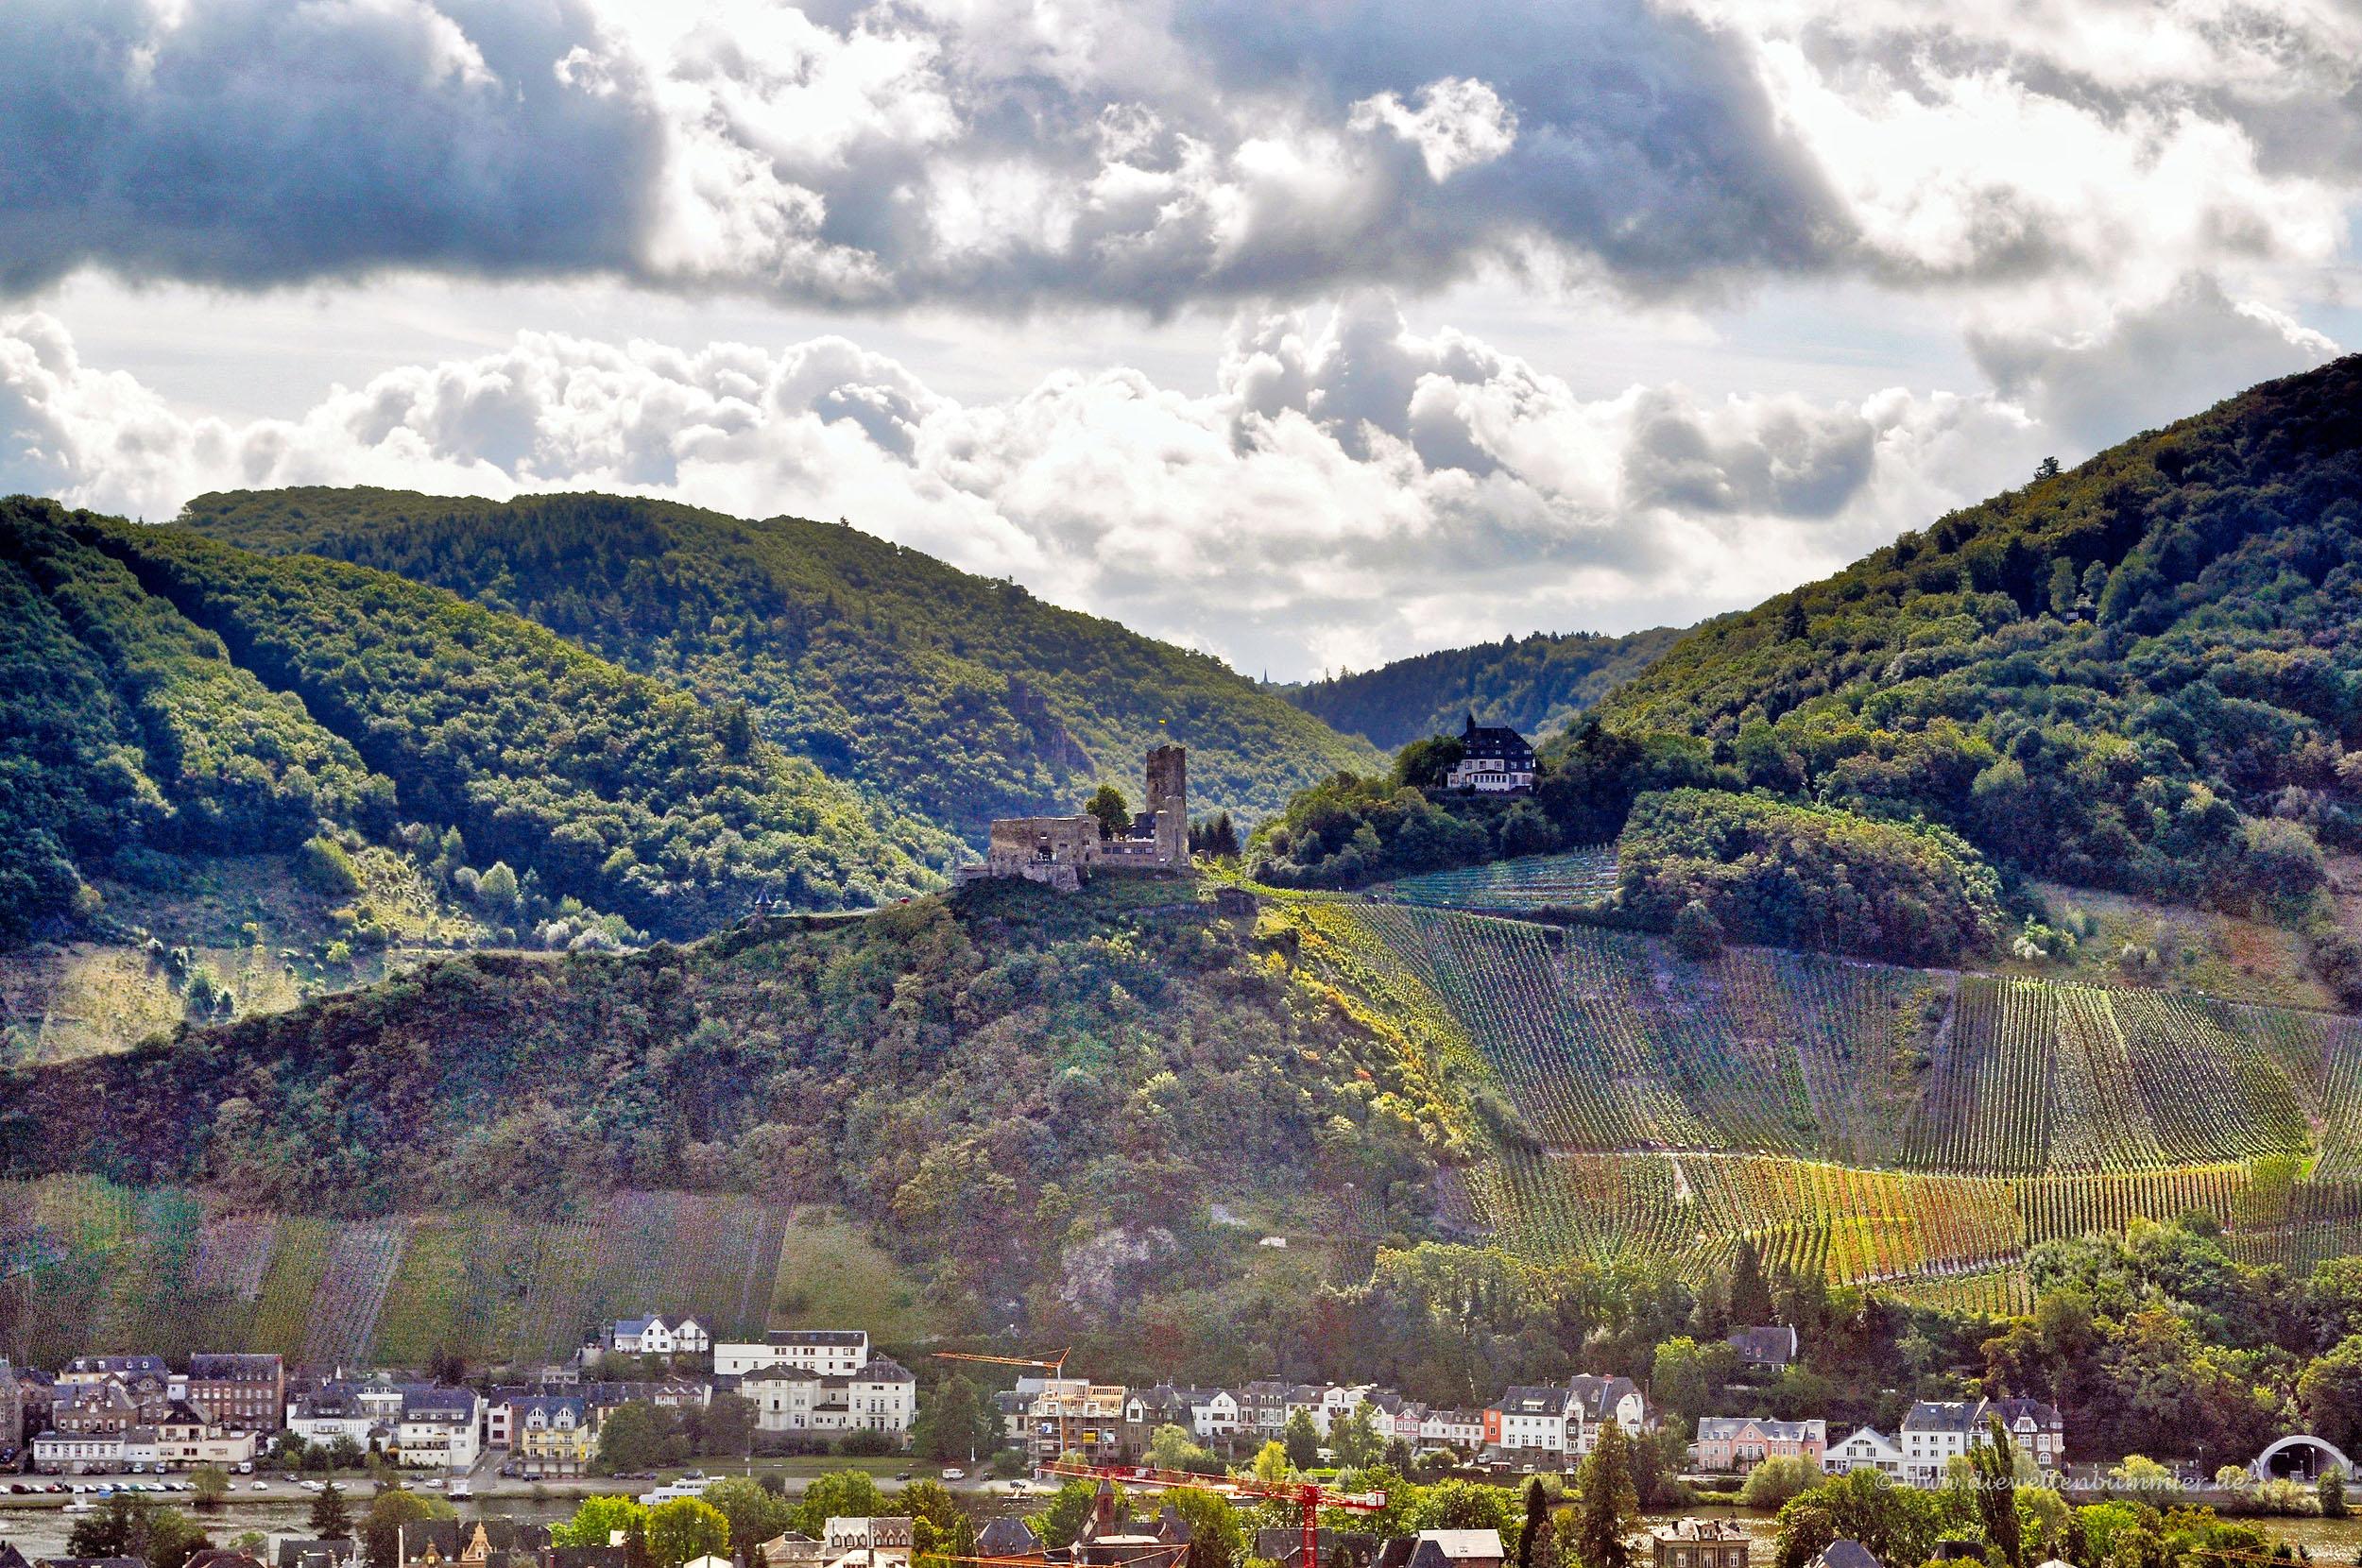 Burgruine Landshut bei Bernkastel-Kues